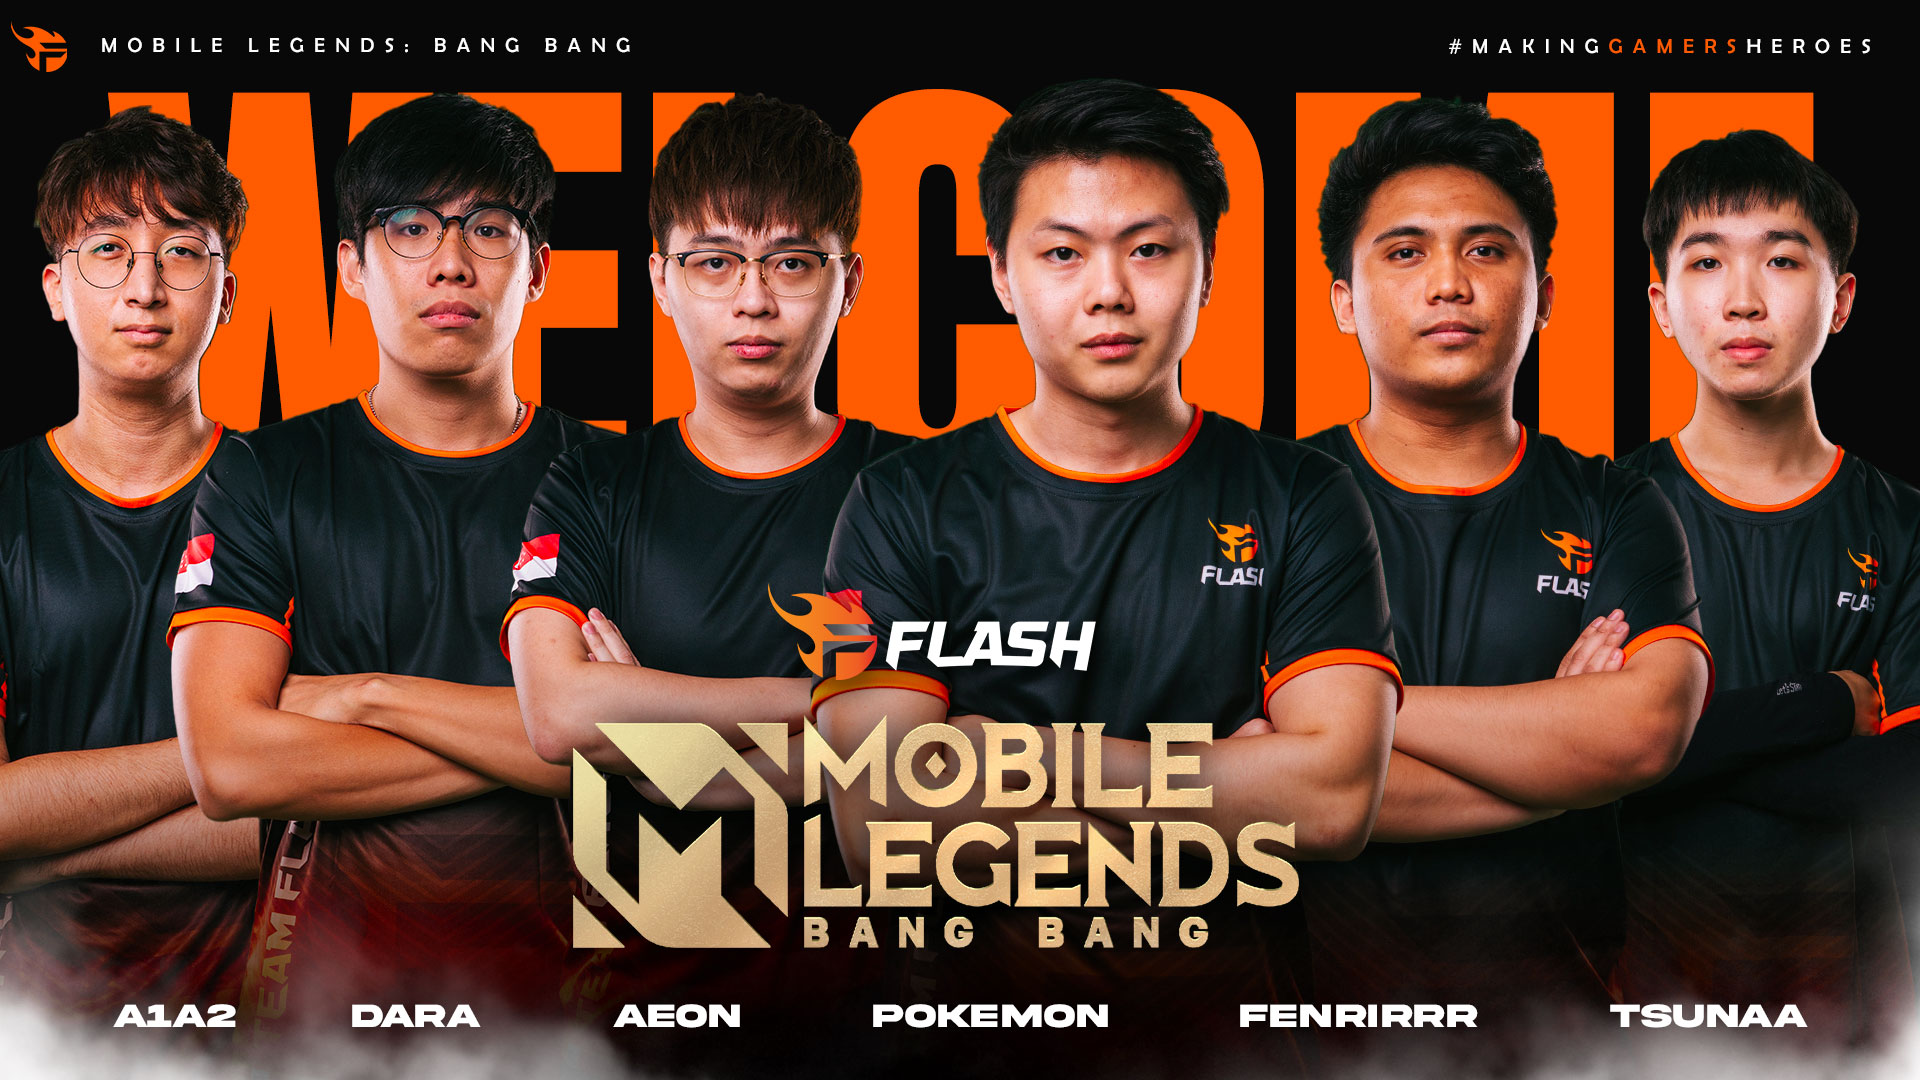 Team Flash returns to Mobile Legends: Bang Bang